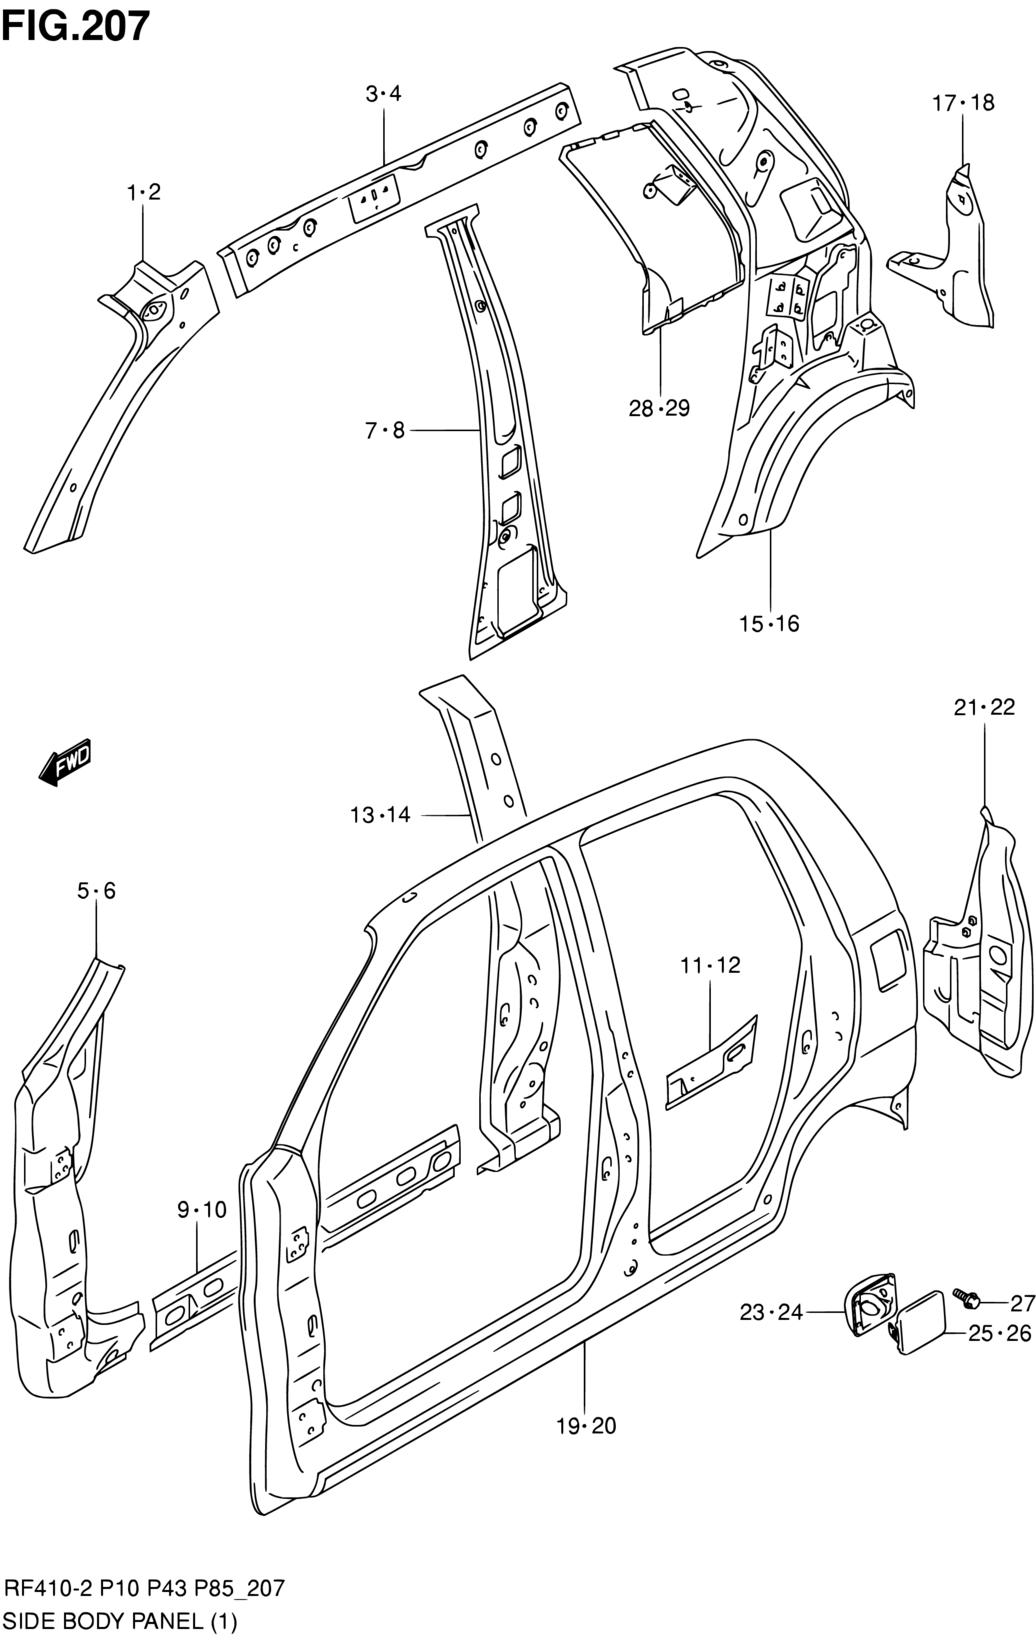 0287ET ETA original parts 11-1//2 2770 ref 182 20.030 barrel with cover N.O.S.